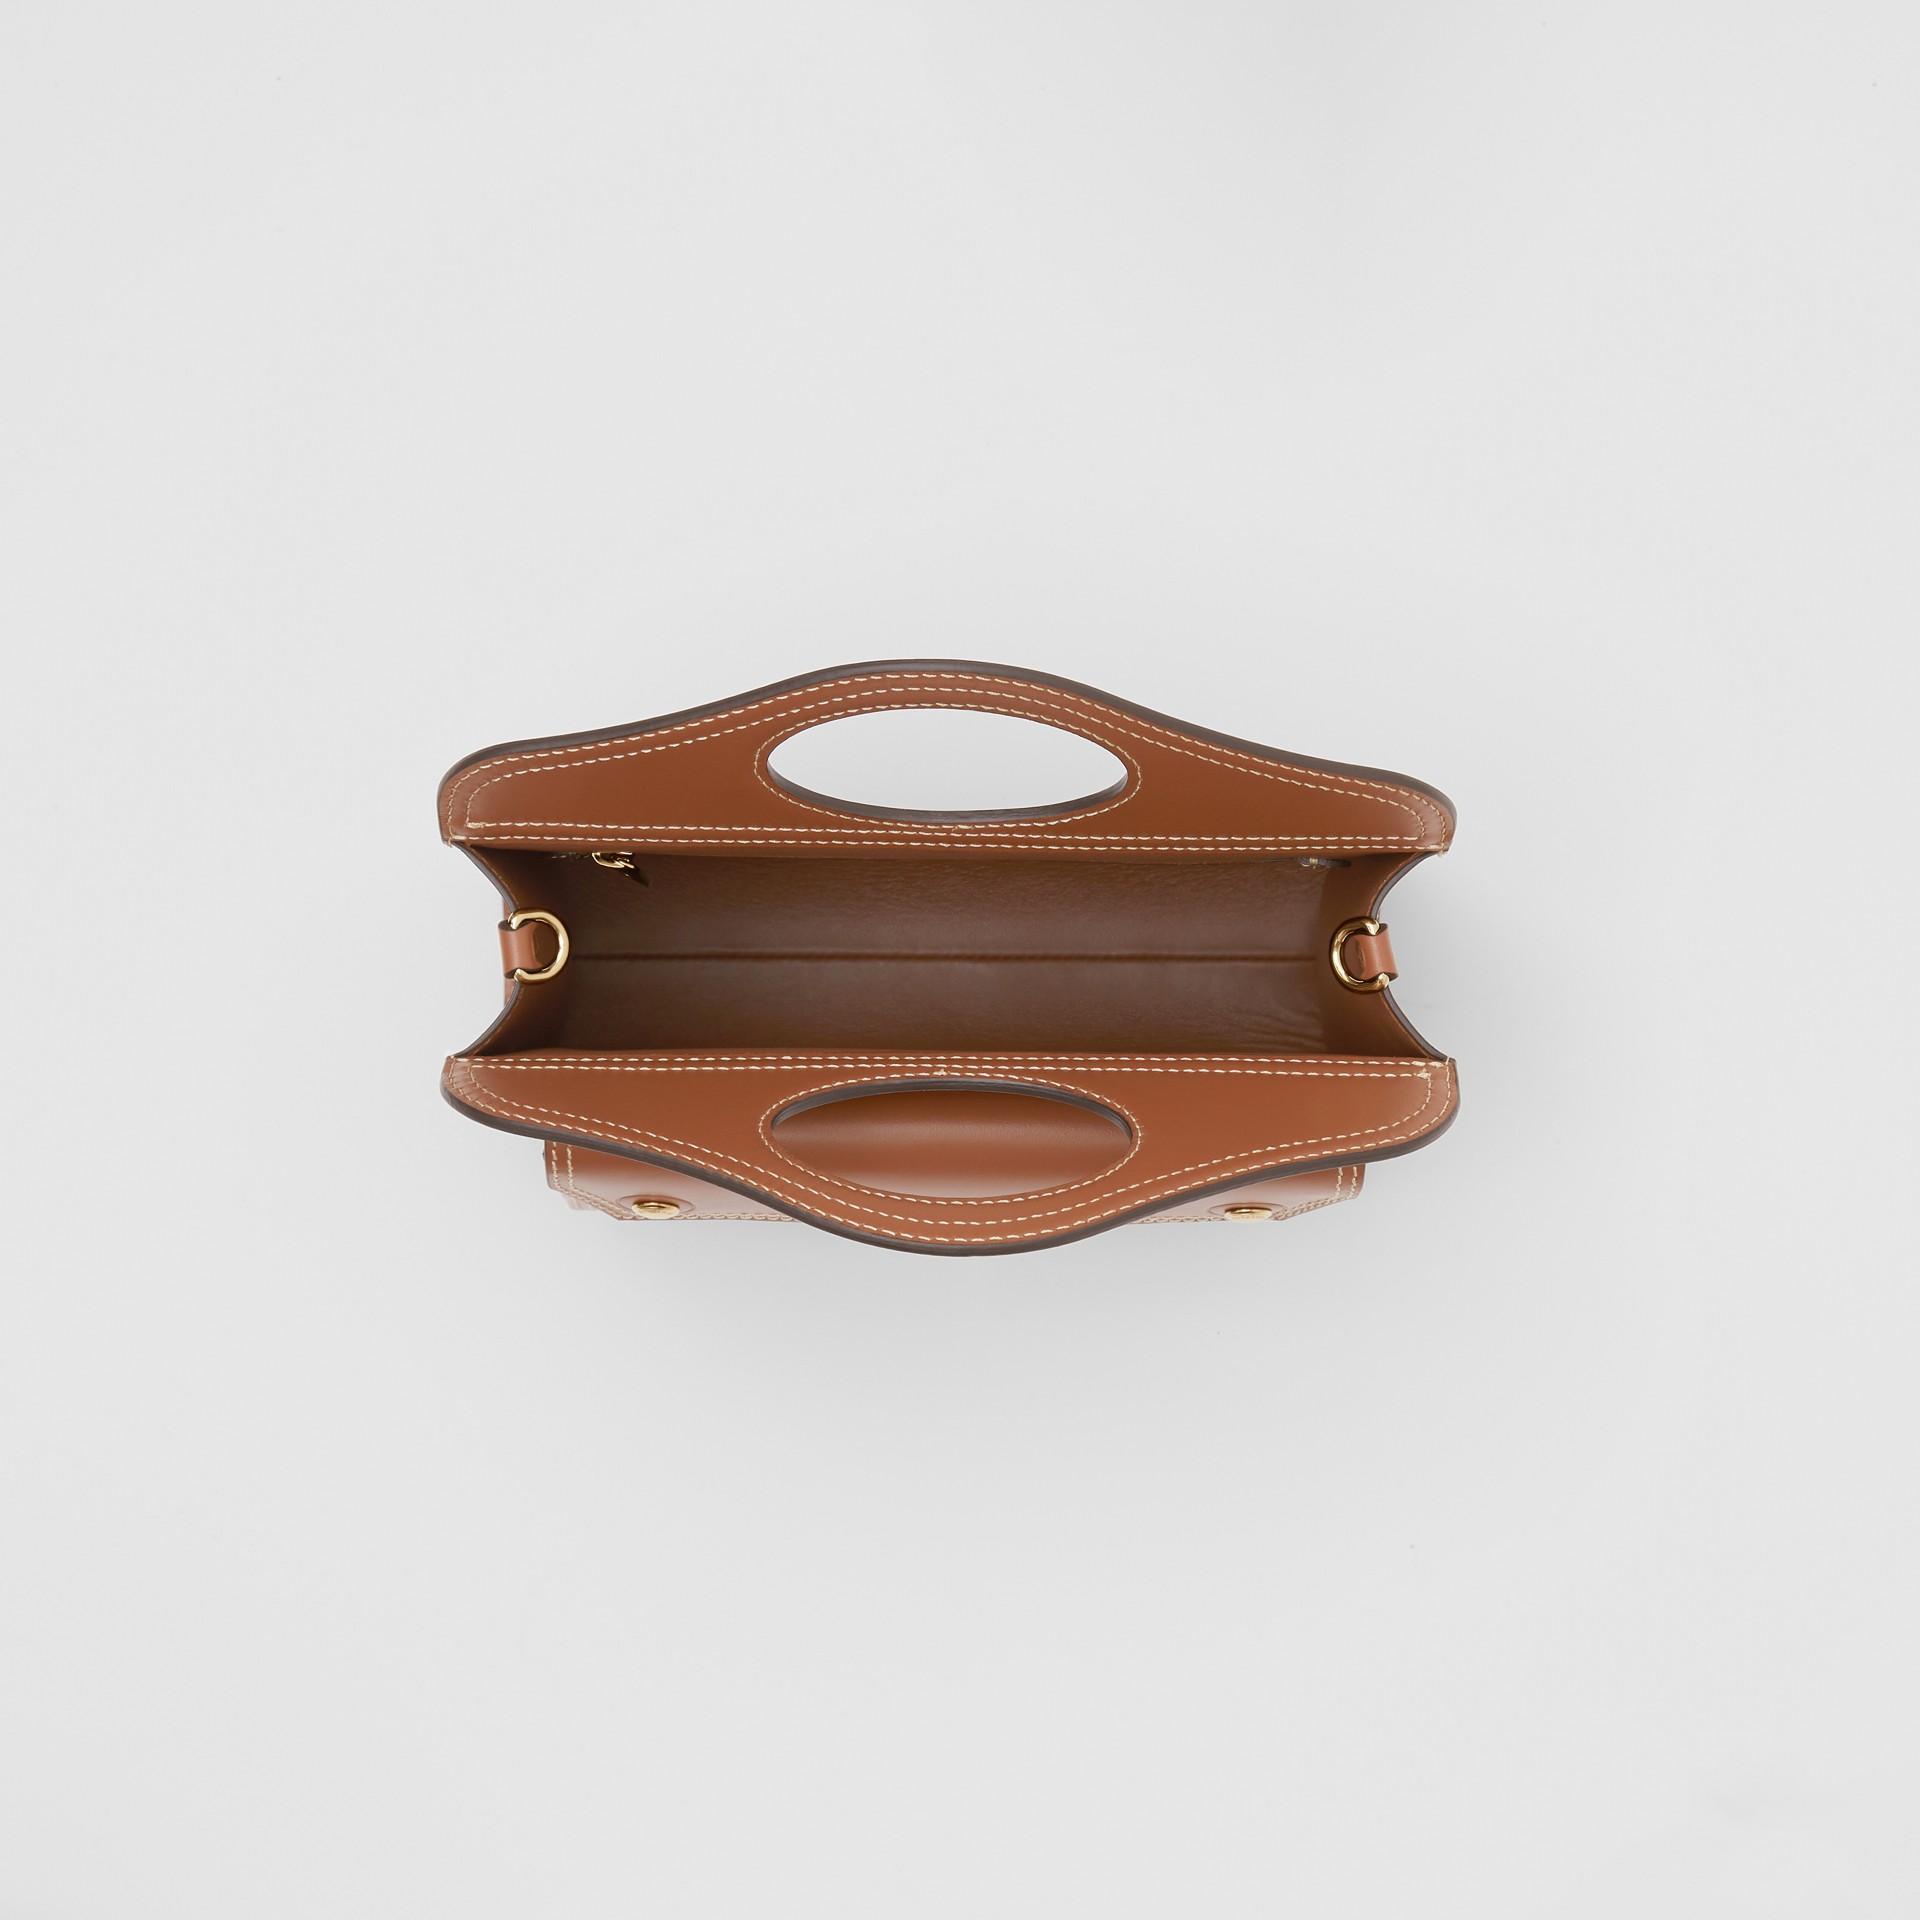 Mini Topstitch Detail Leather Pocket Bag in Malt Brown - Women | Burberry United Kingdom - gallery image 4